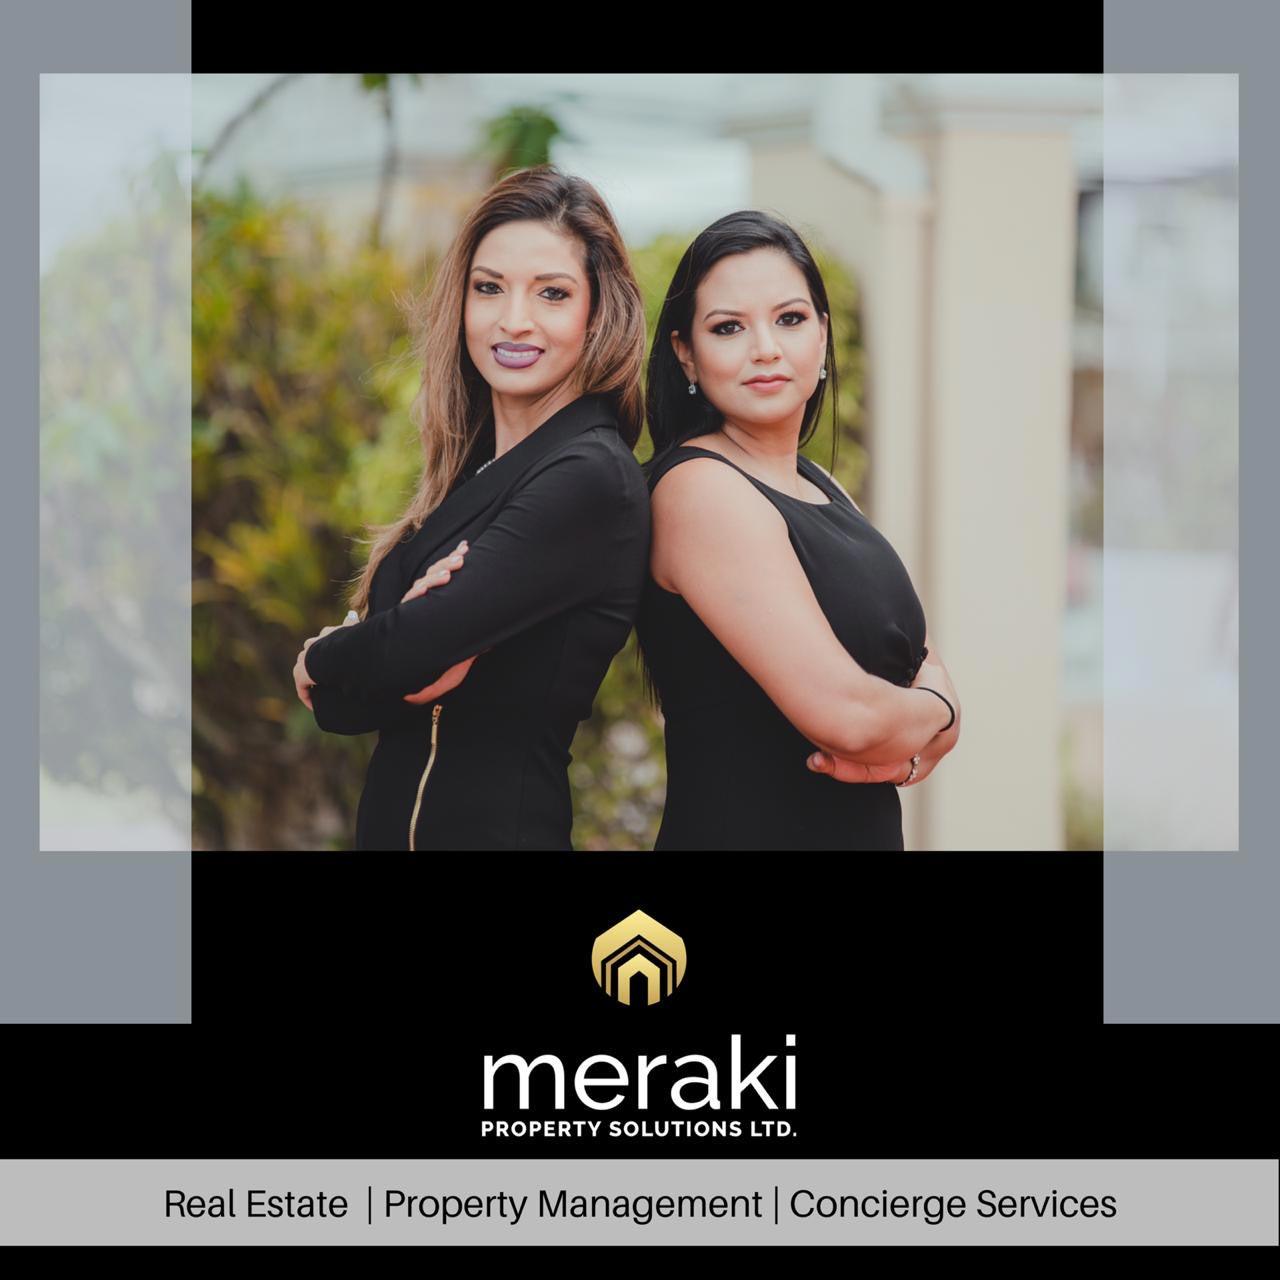 Meraki Property Solutions